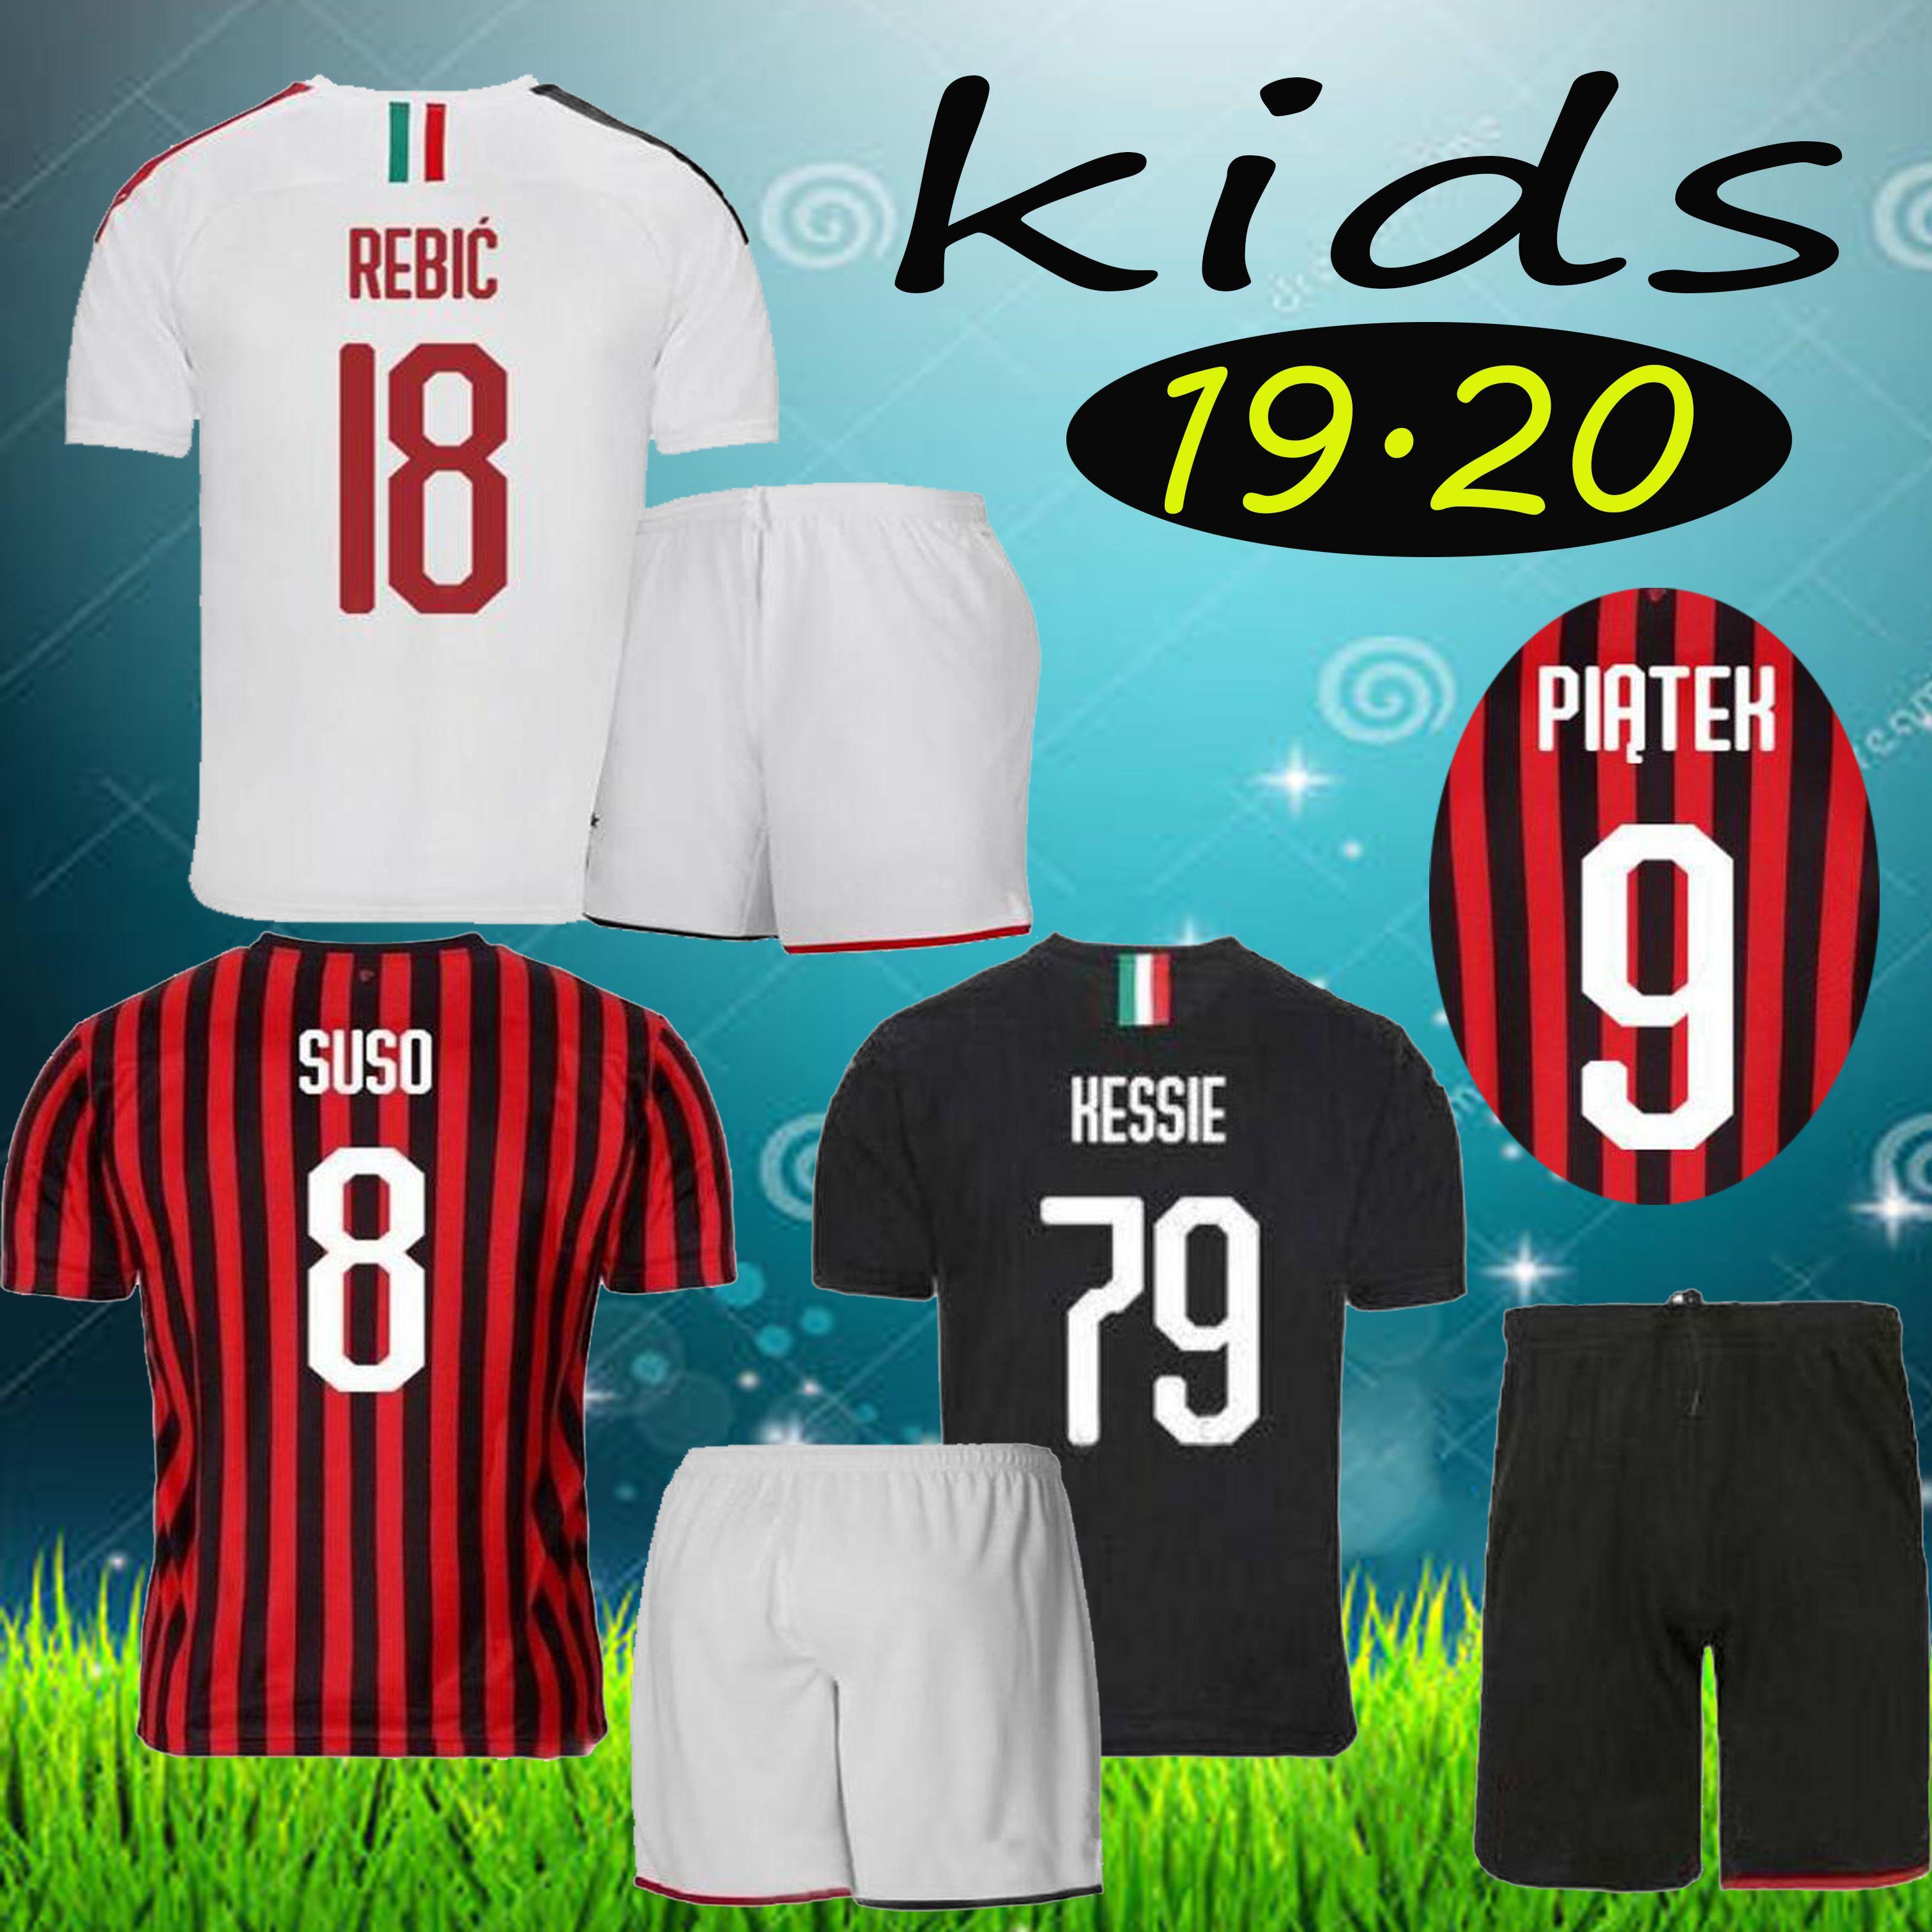 19//20 Season Football Kids Home Kit Jersey Short Sleeve Sport Outfit+Socks New